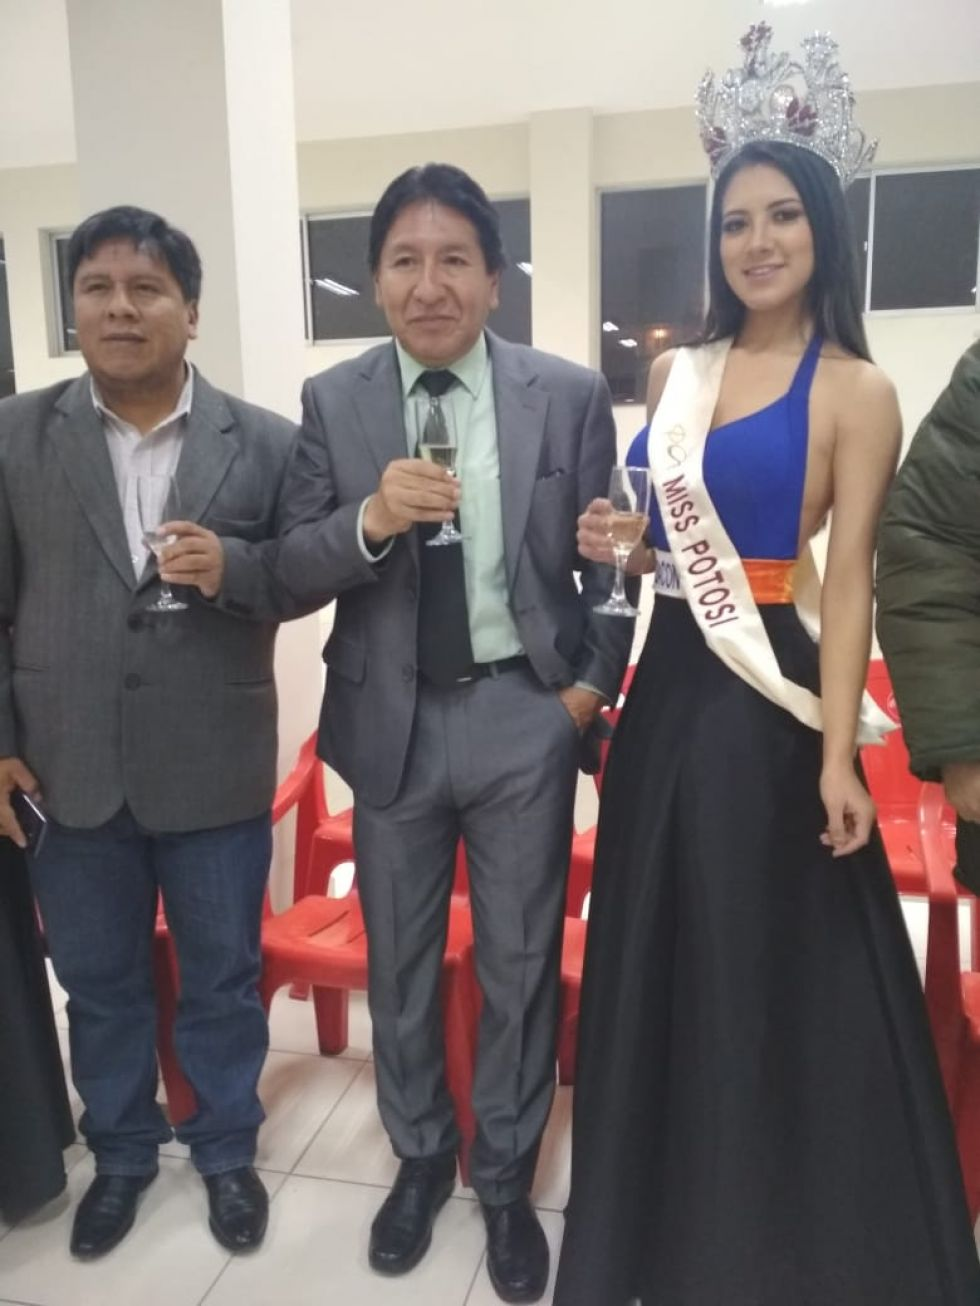 Con Miss Potosí, Pamela Caviedes